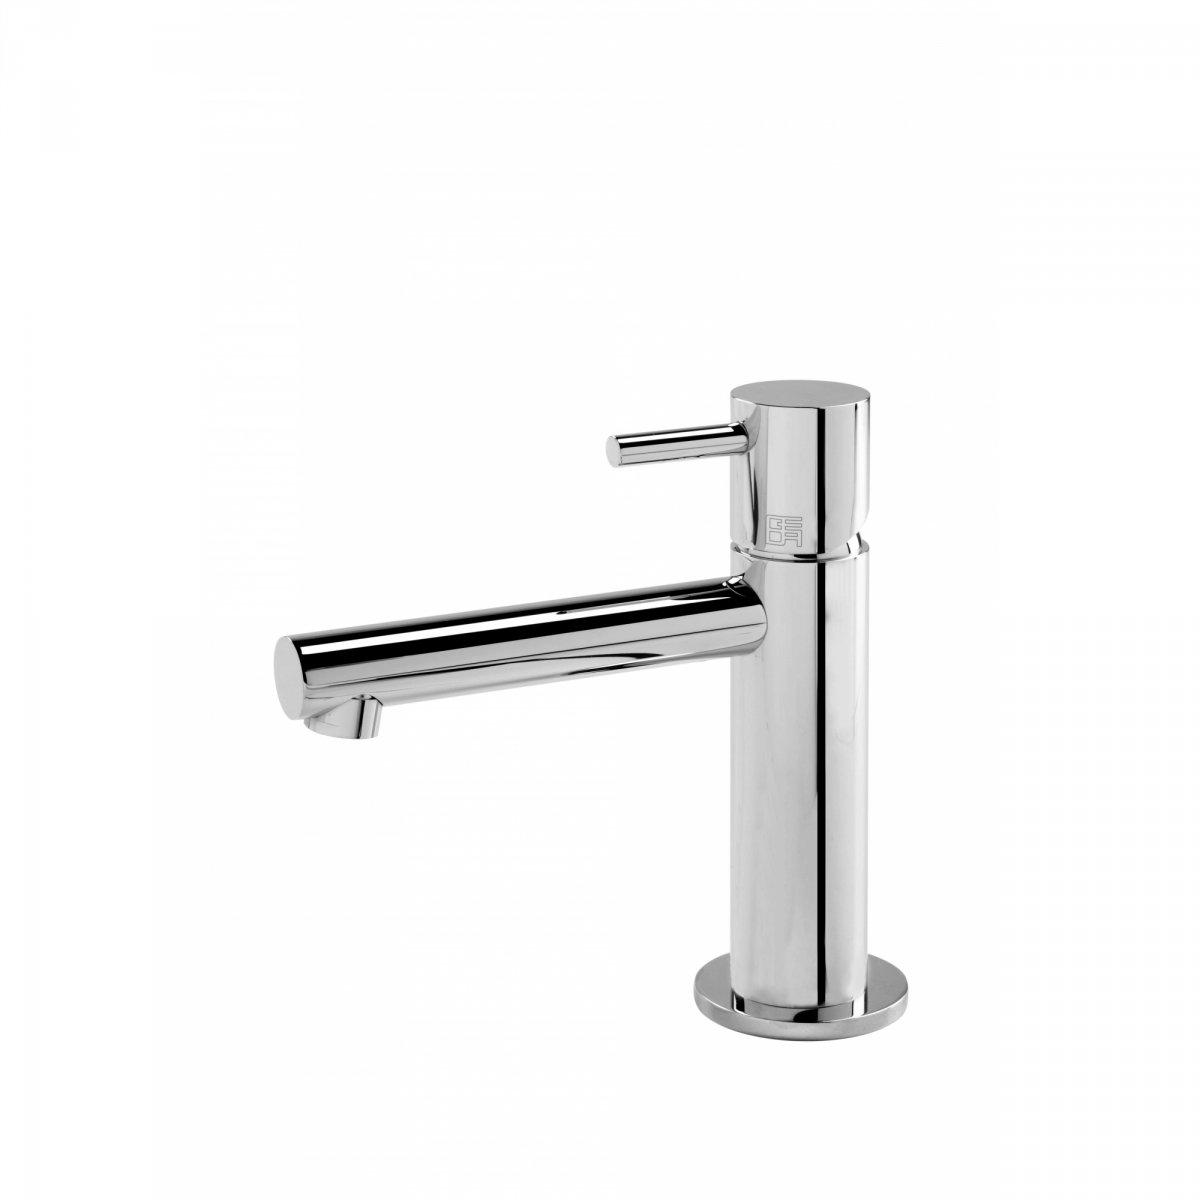 Geda al miscelatore lavabo geda bagno rubinetteria - Rubinetteria lavabo bagno ...